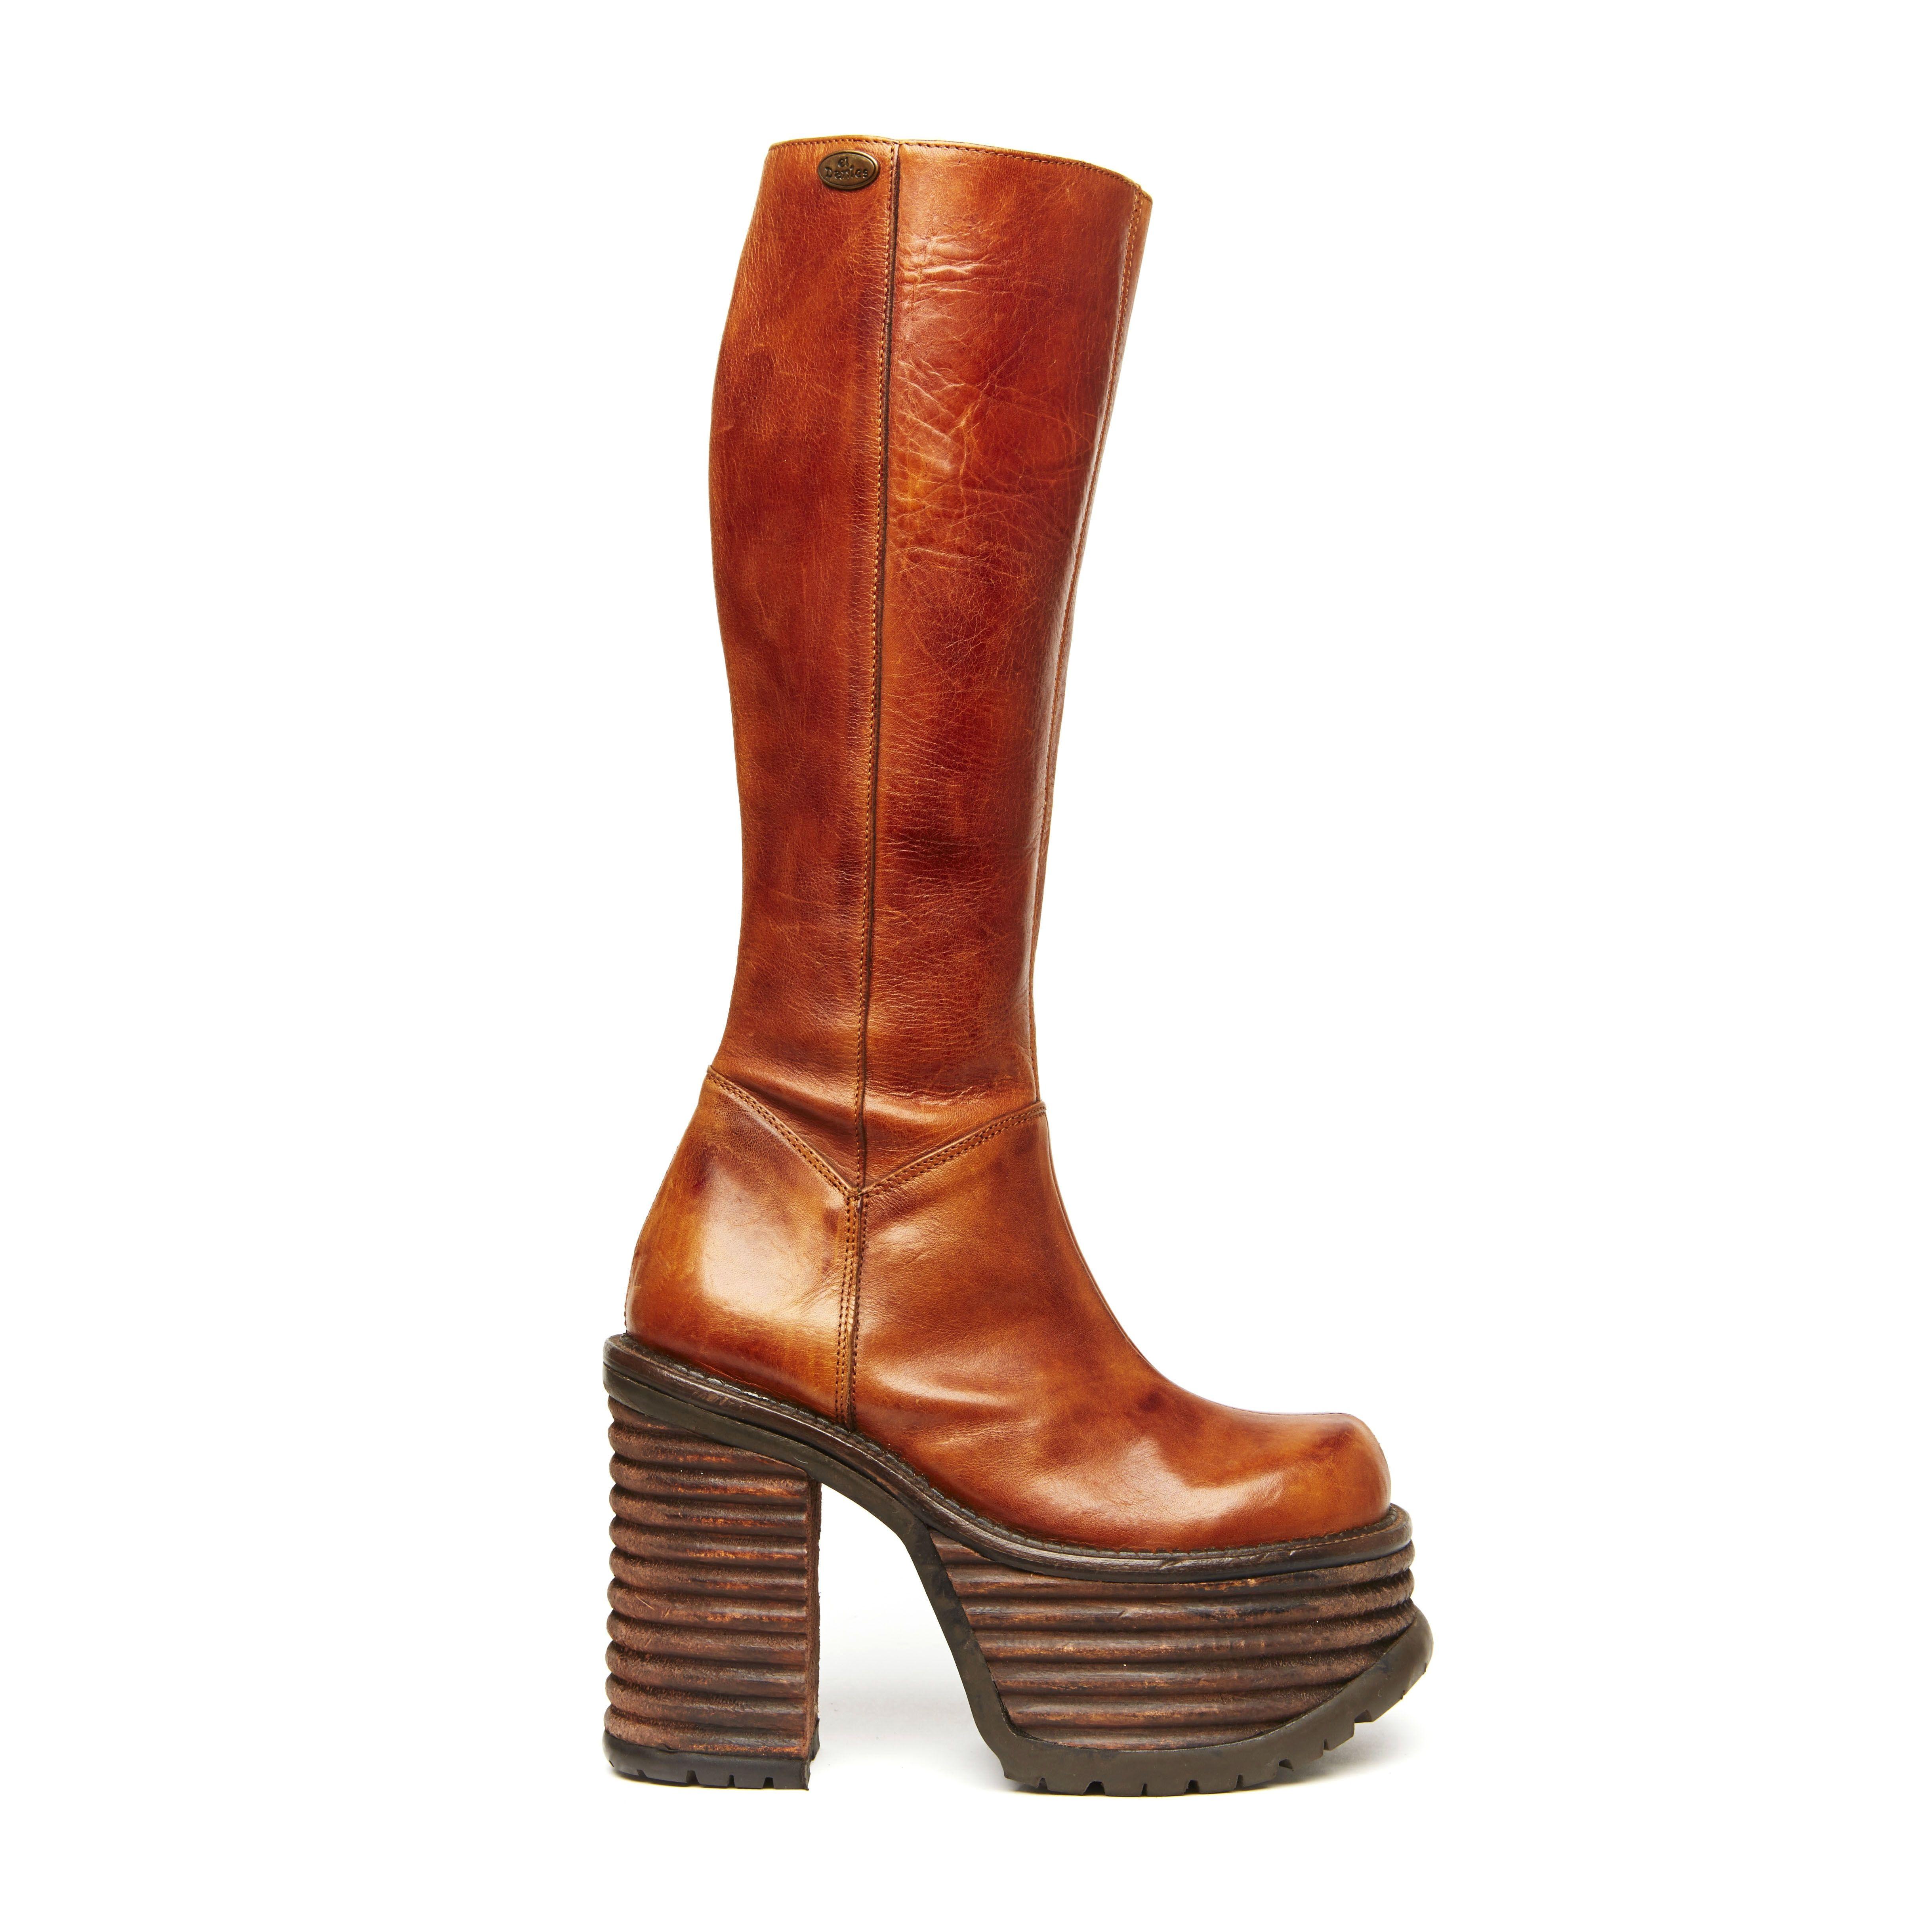 OMG Shoes // American Deadstock